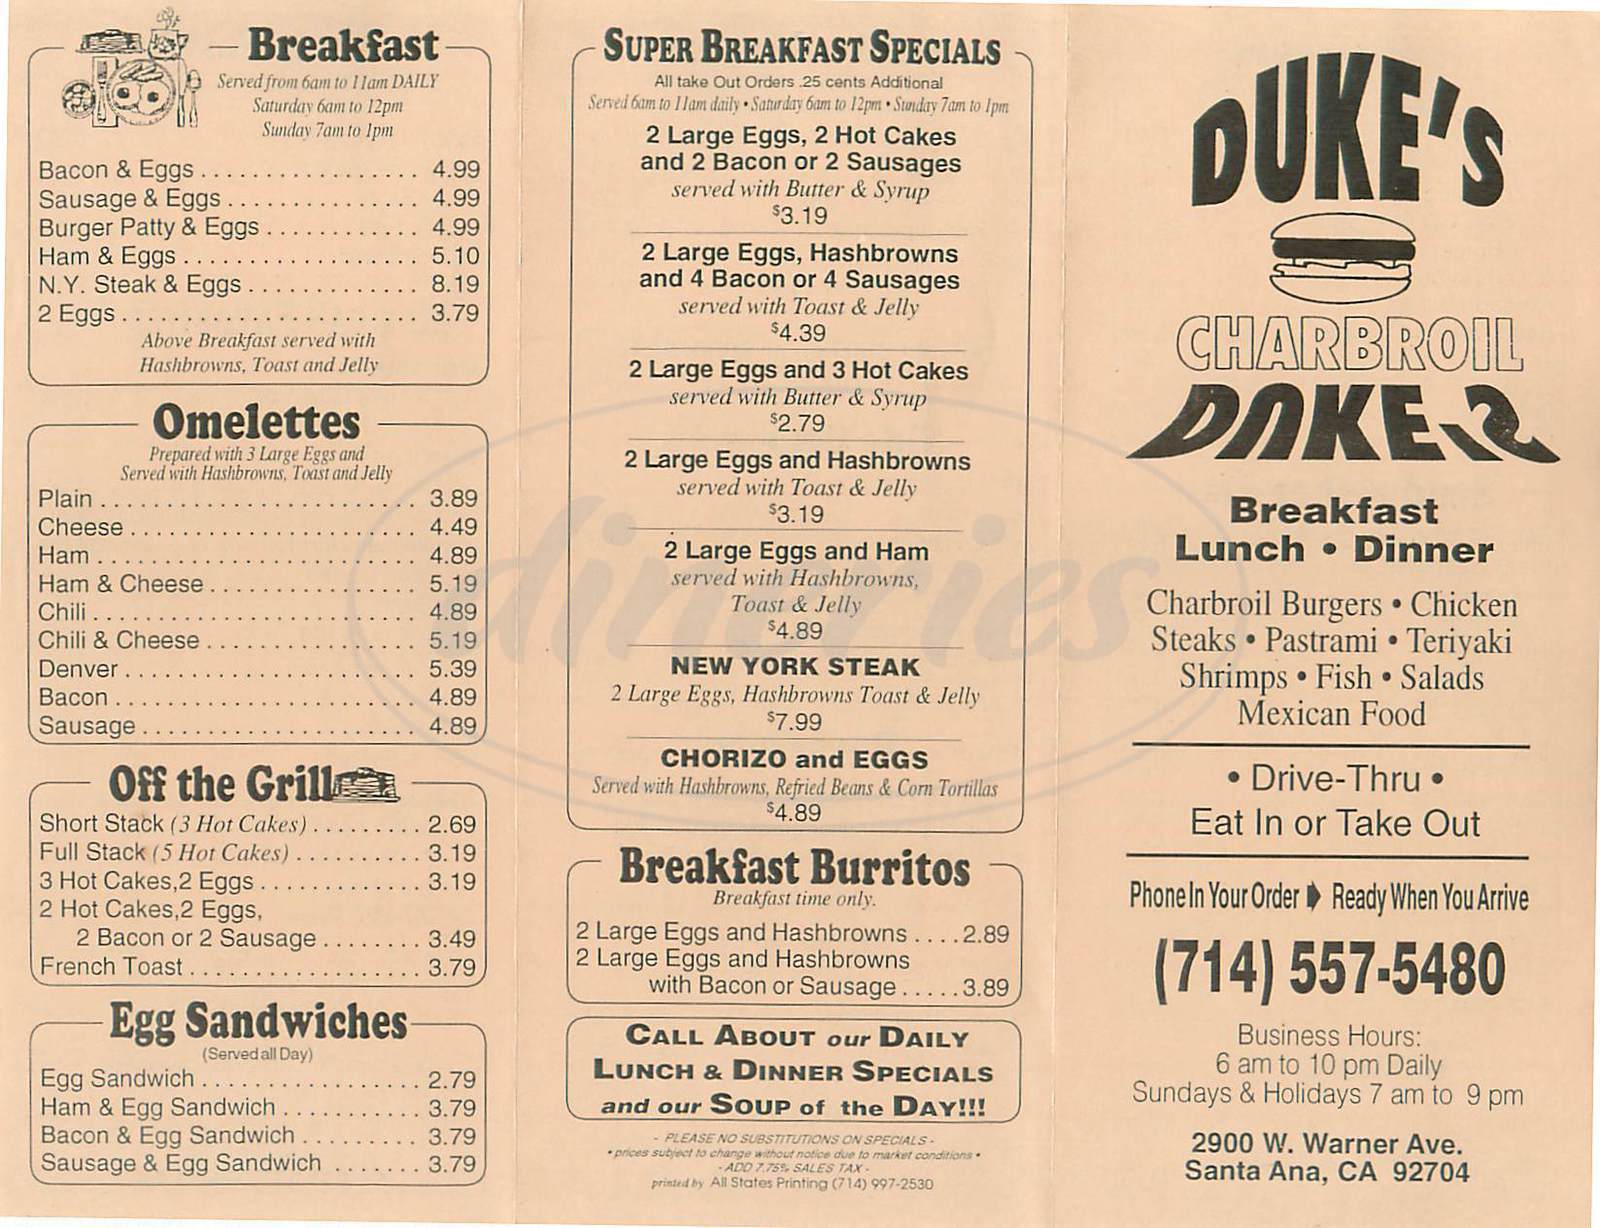 menu for Dukes Charbroile